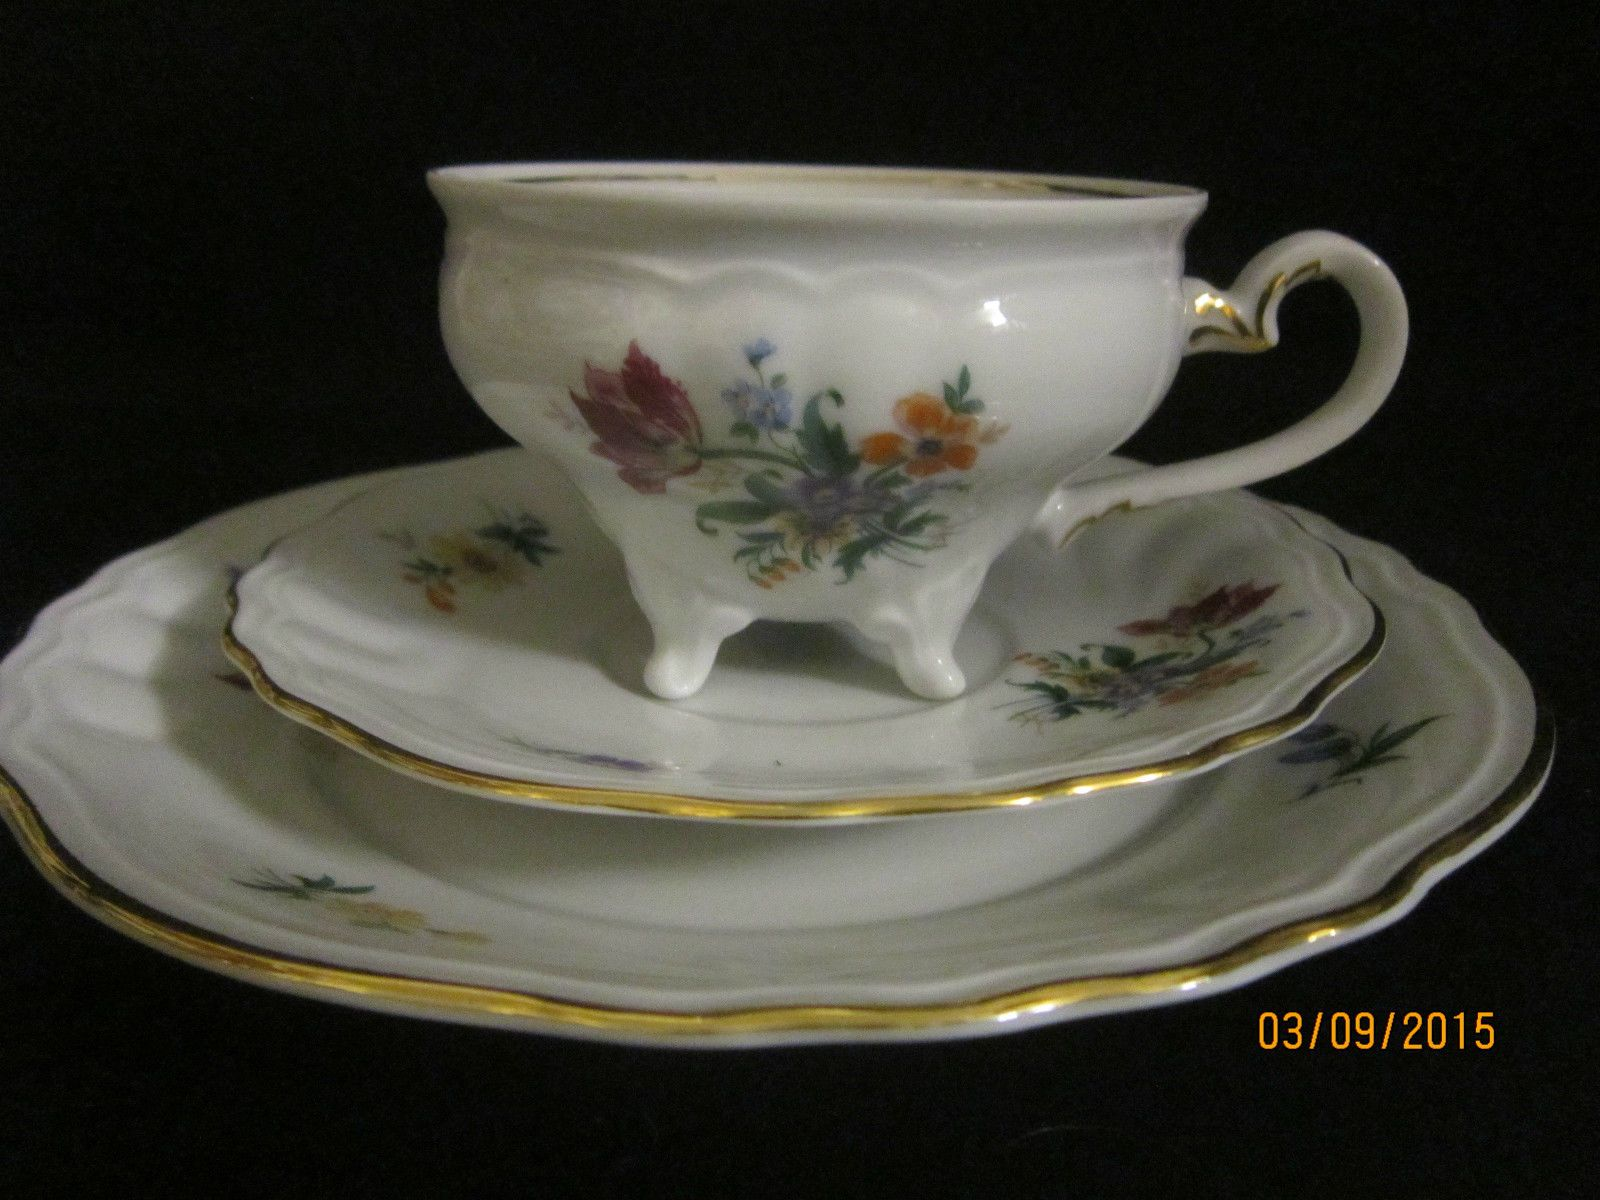 sammeltasse 3tlg weimarer porzellan tasse auf 4 f en sammelgedecke teacup trios. Black Bedroom Furniture Sets. Home Design Ideas